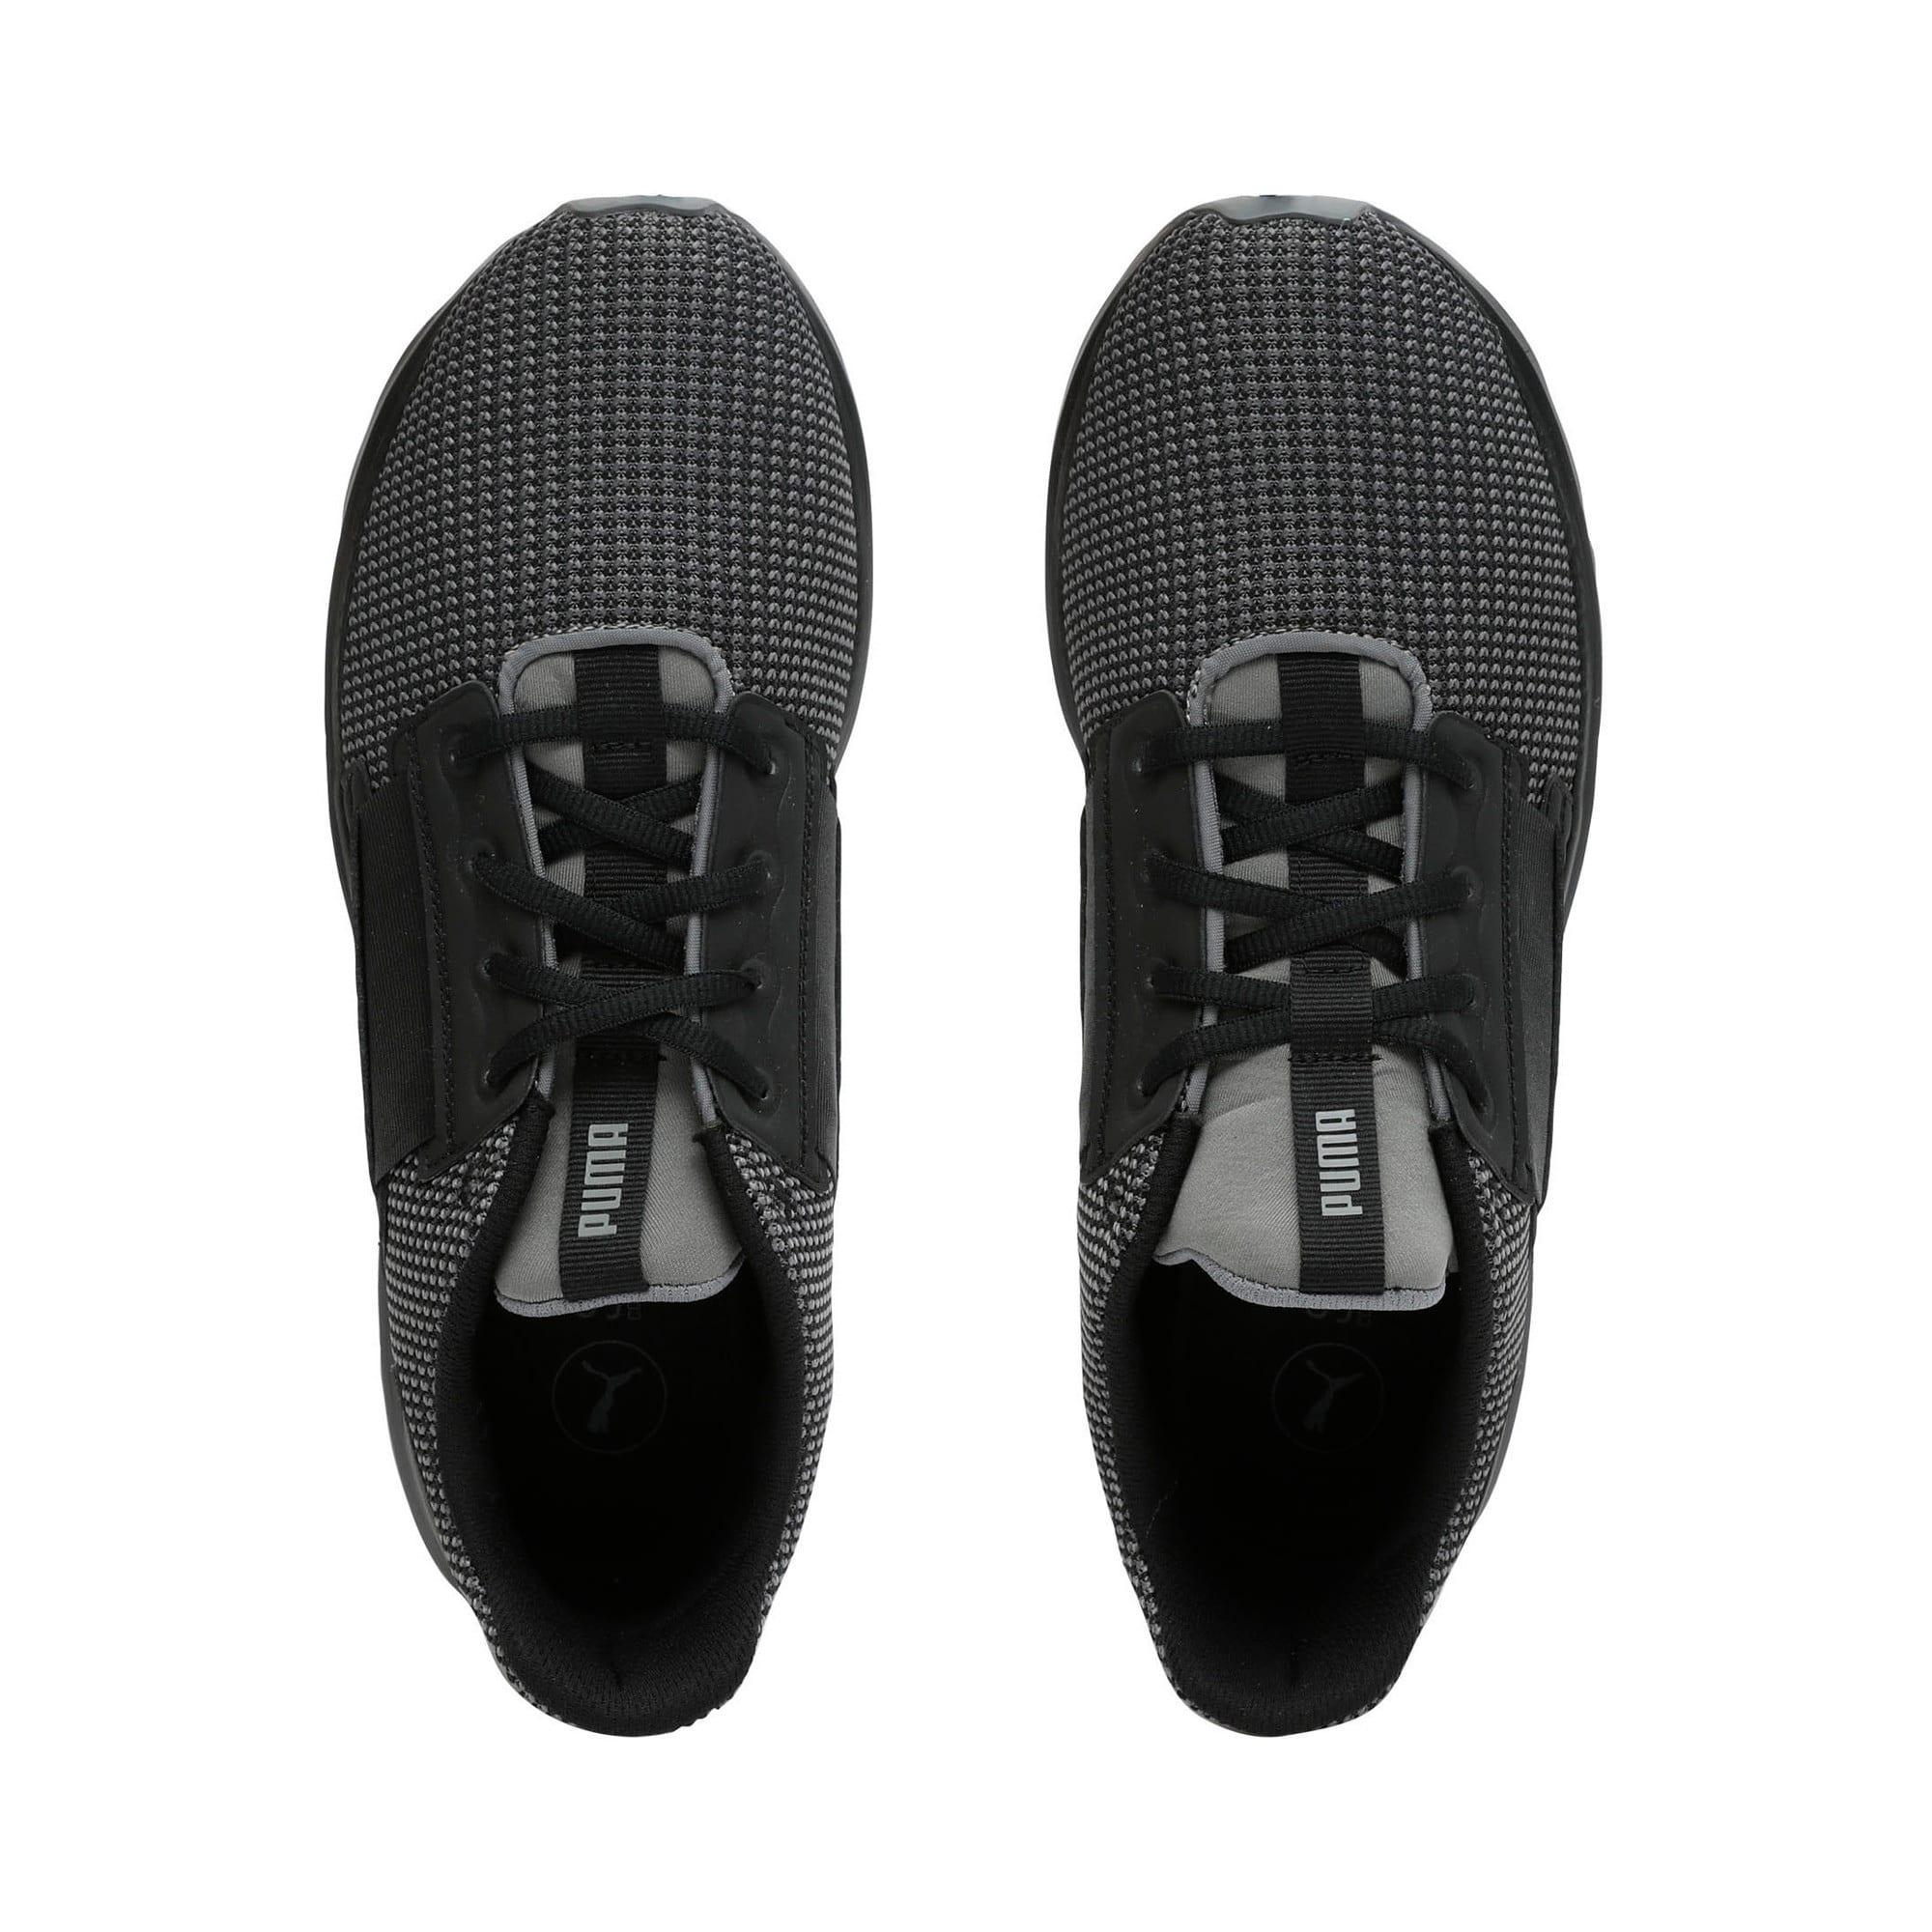 Thumbnail 6 of Enzo Street Knit Men's Running Shoes, QUIET SHADE-Puma Black, medium-IND